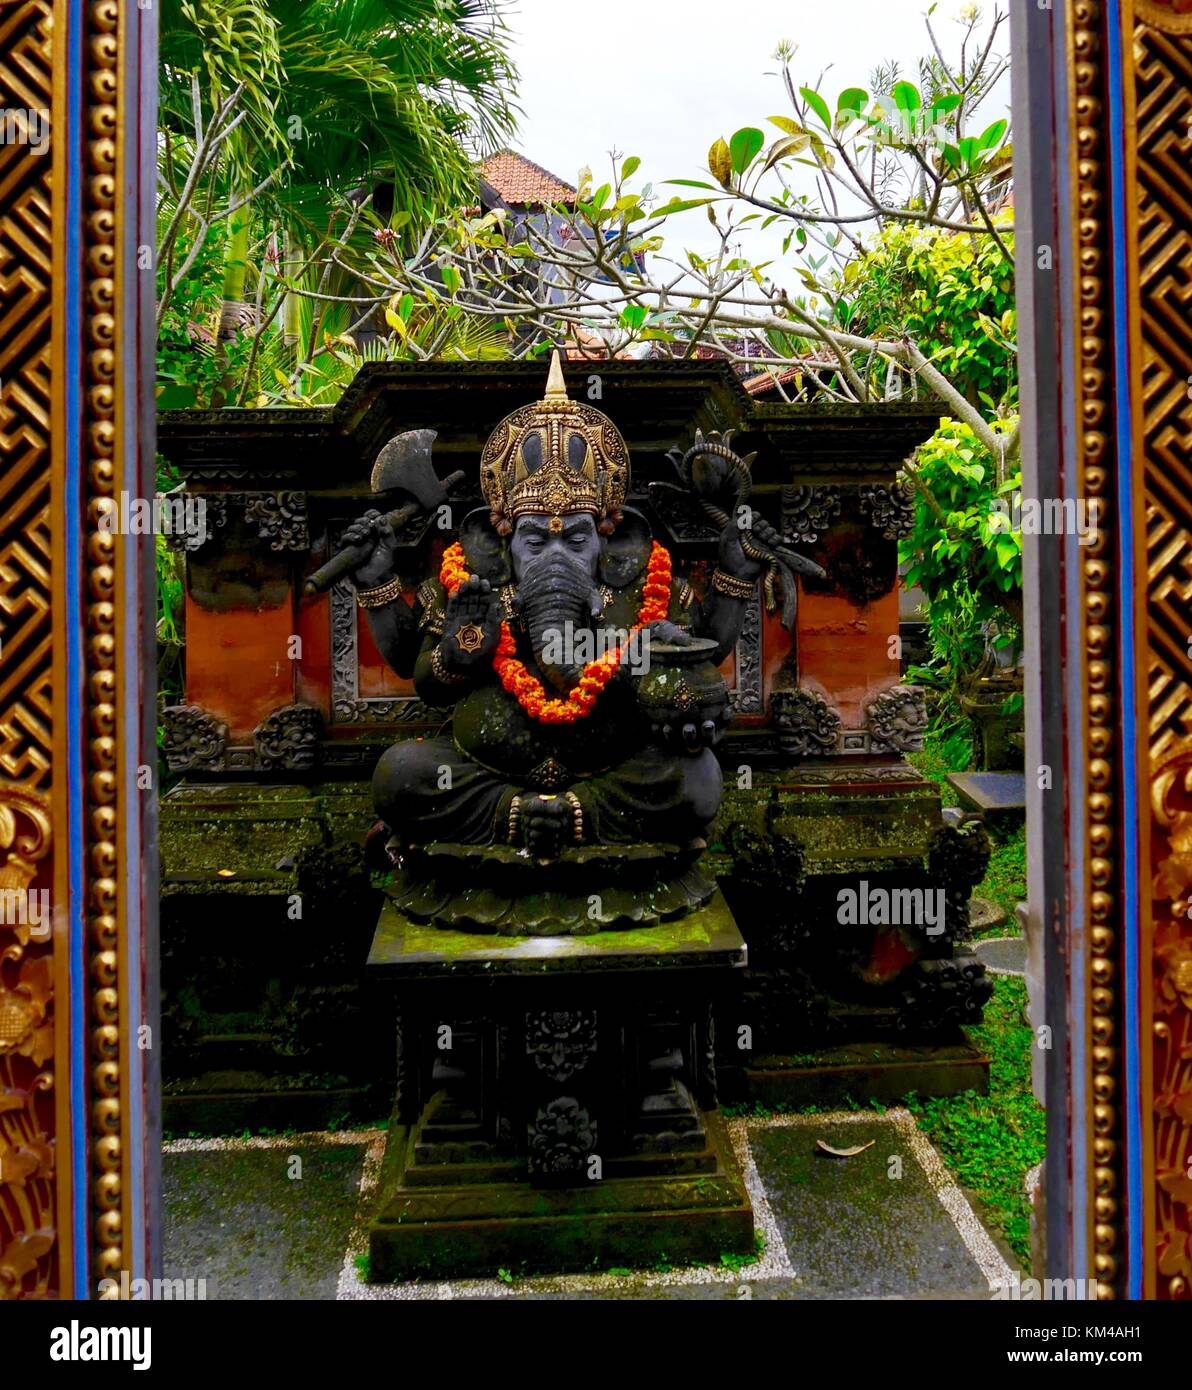 Vertical shot of statue of elephant-headed Hindu god Ganesha (Ganesh) with marigold garland in leafy temple garden, Stock Photo